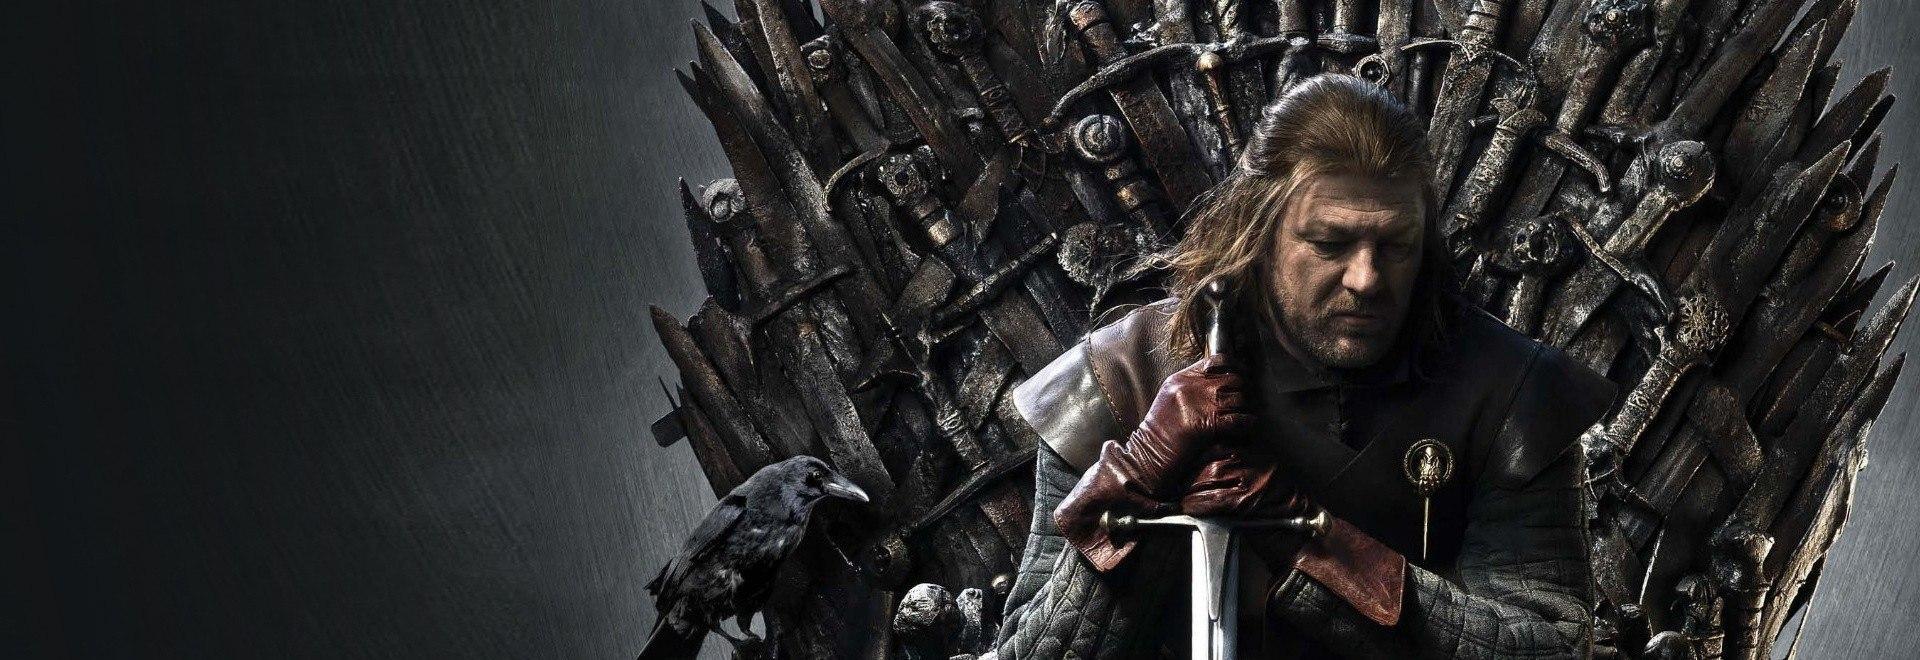 La strada del re